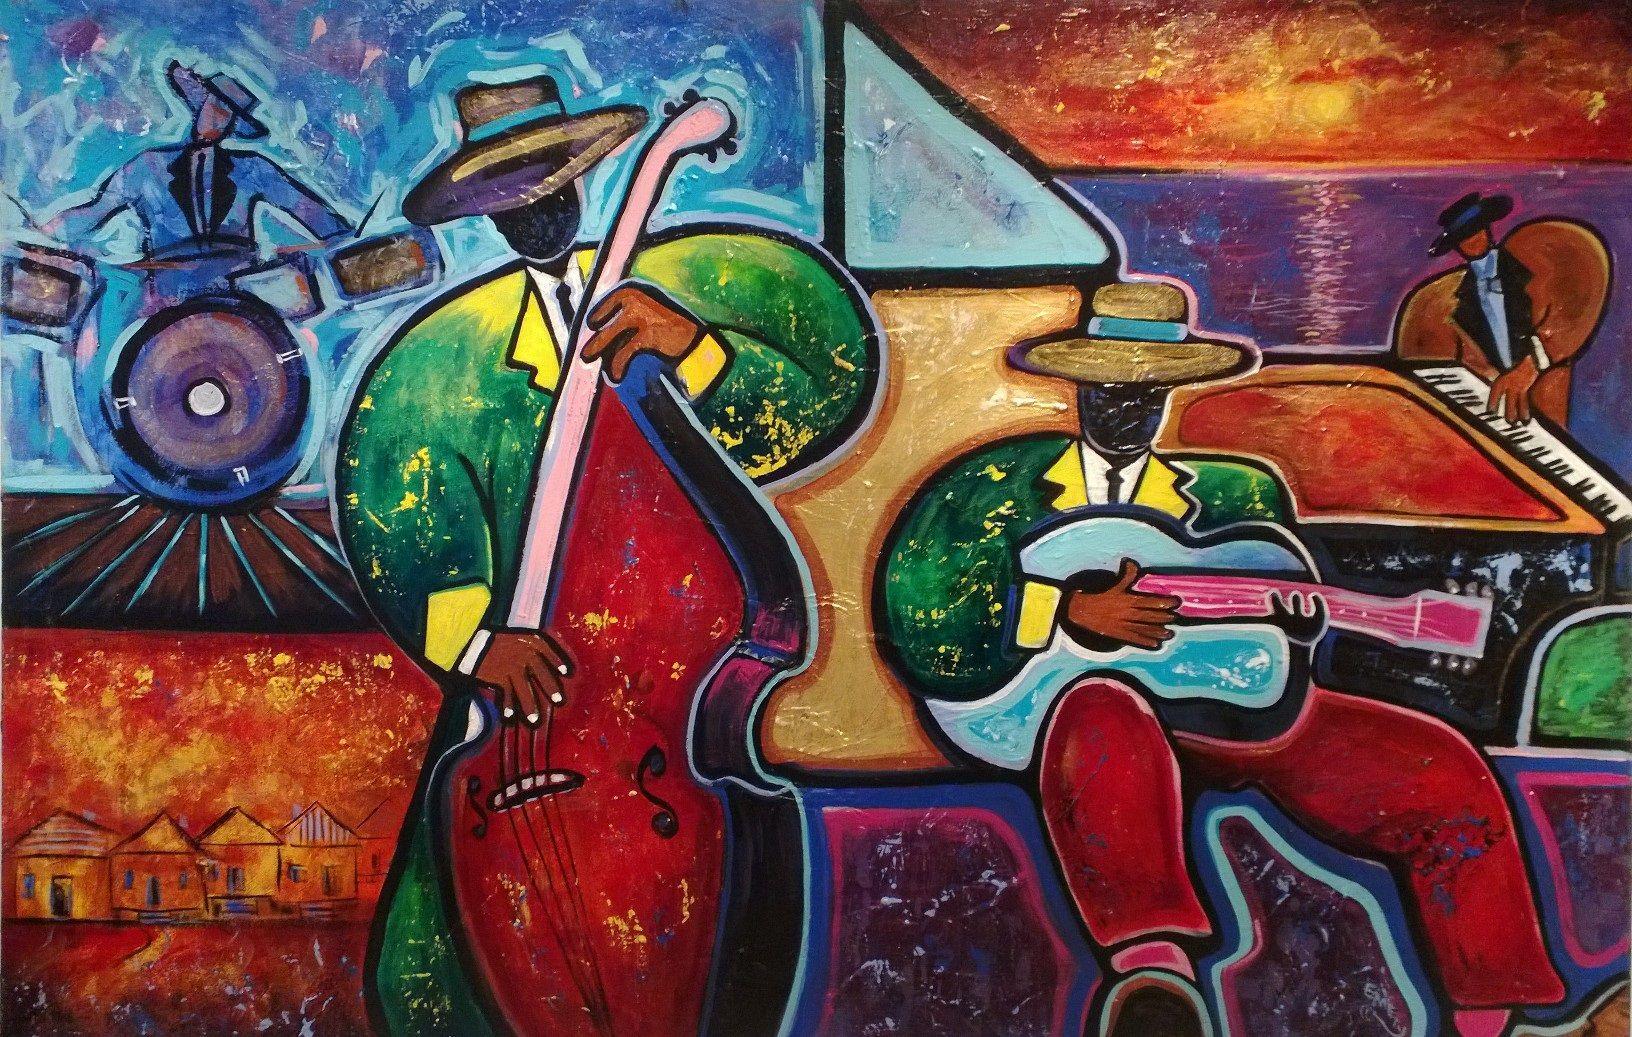 """Jazz Festival"" new music art from Memphis artist Emery Franklin...hip, colorful, creative. (Courtesy of Insky's Art, Birmingham, AL)"